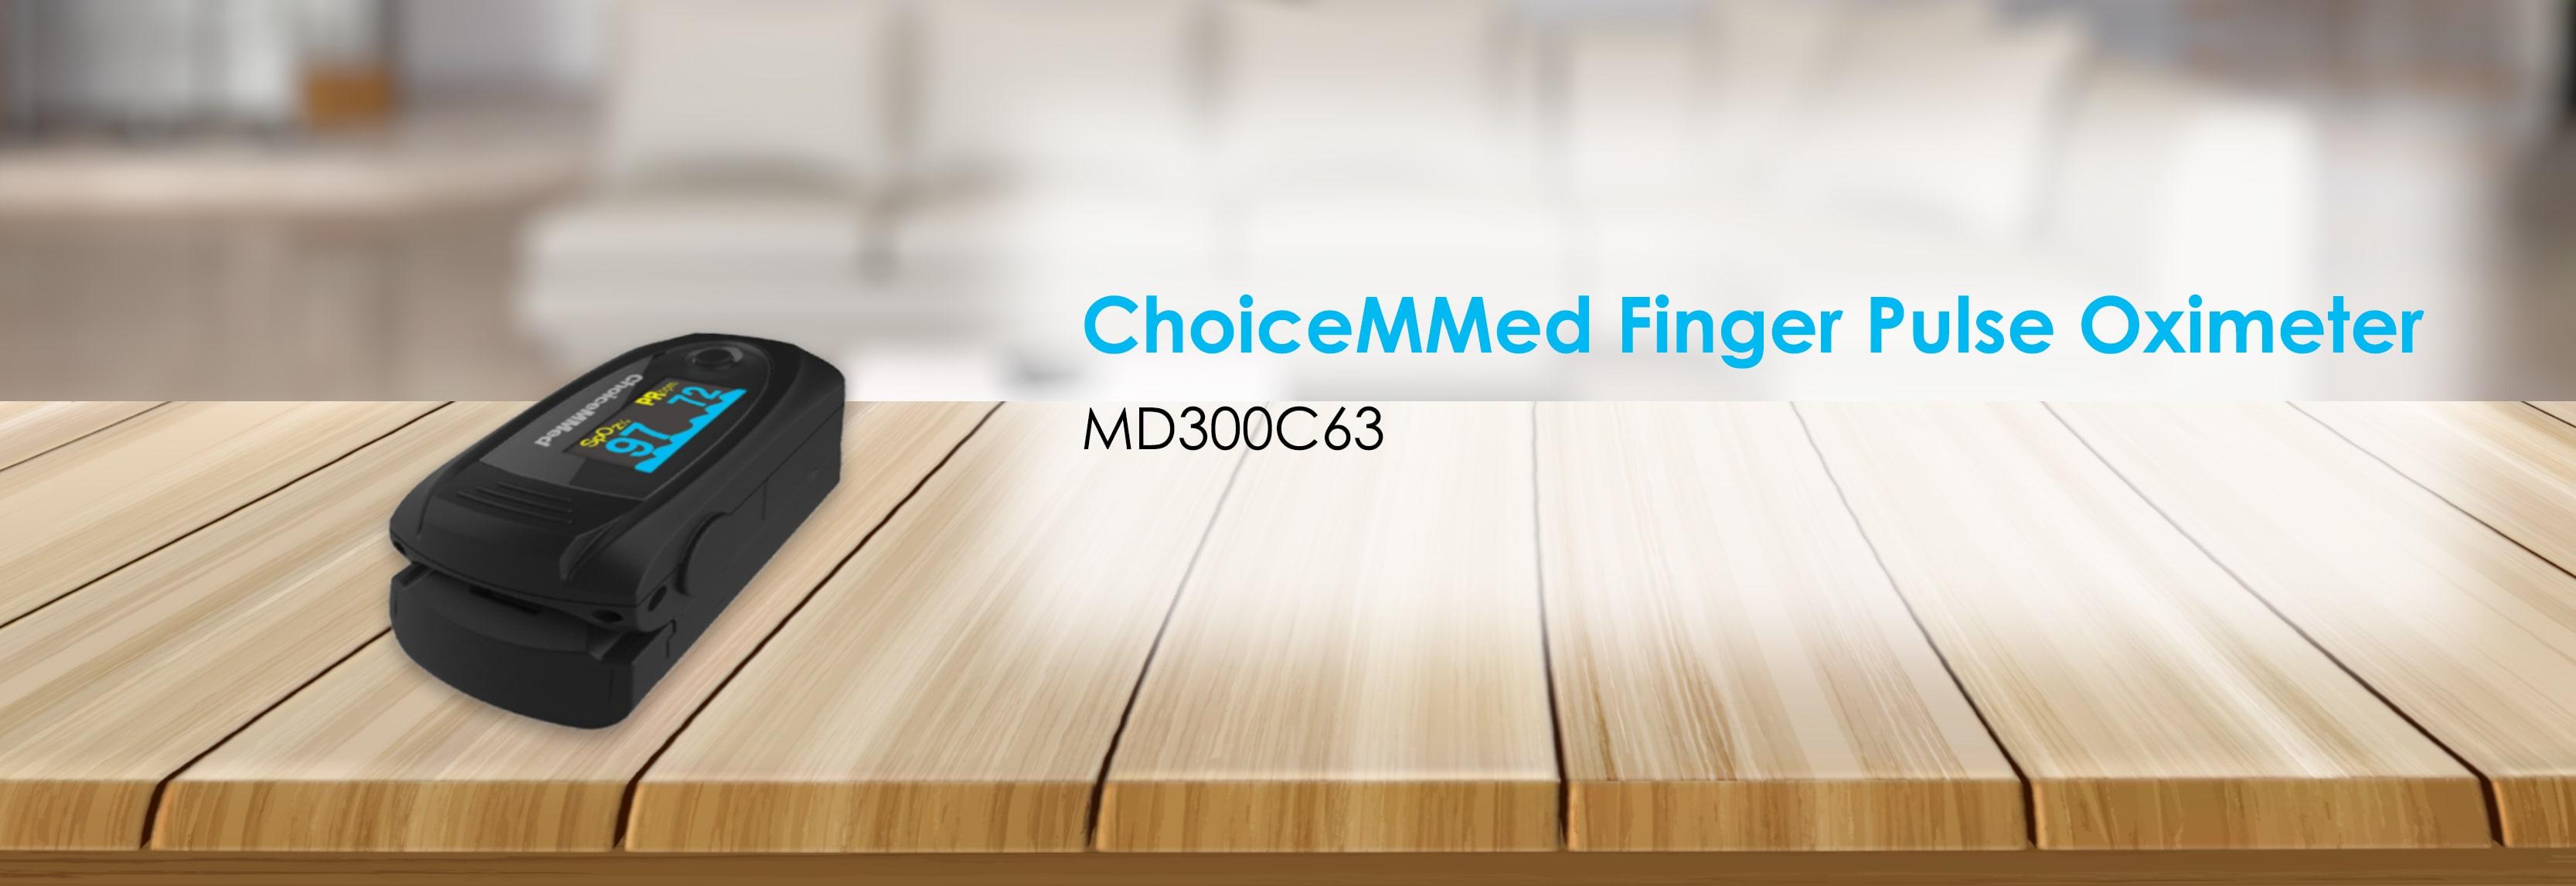 MD300C63_Banner-min.jpg